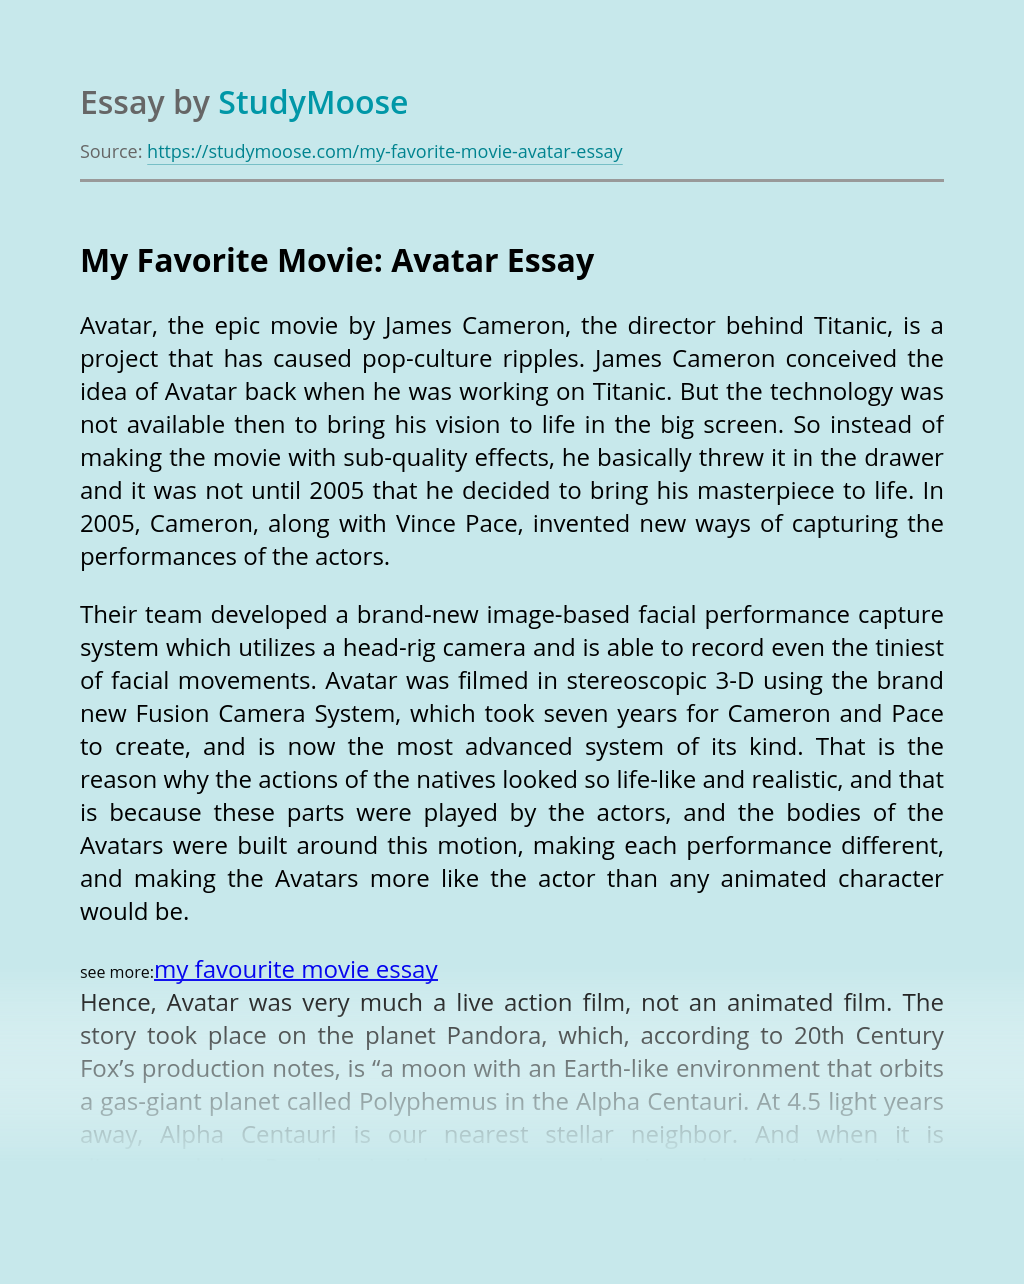 My Favorite Movie: Avatar